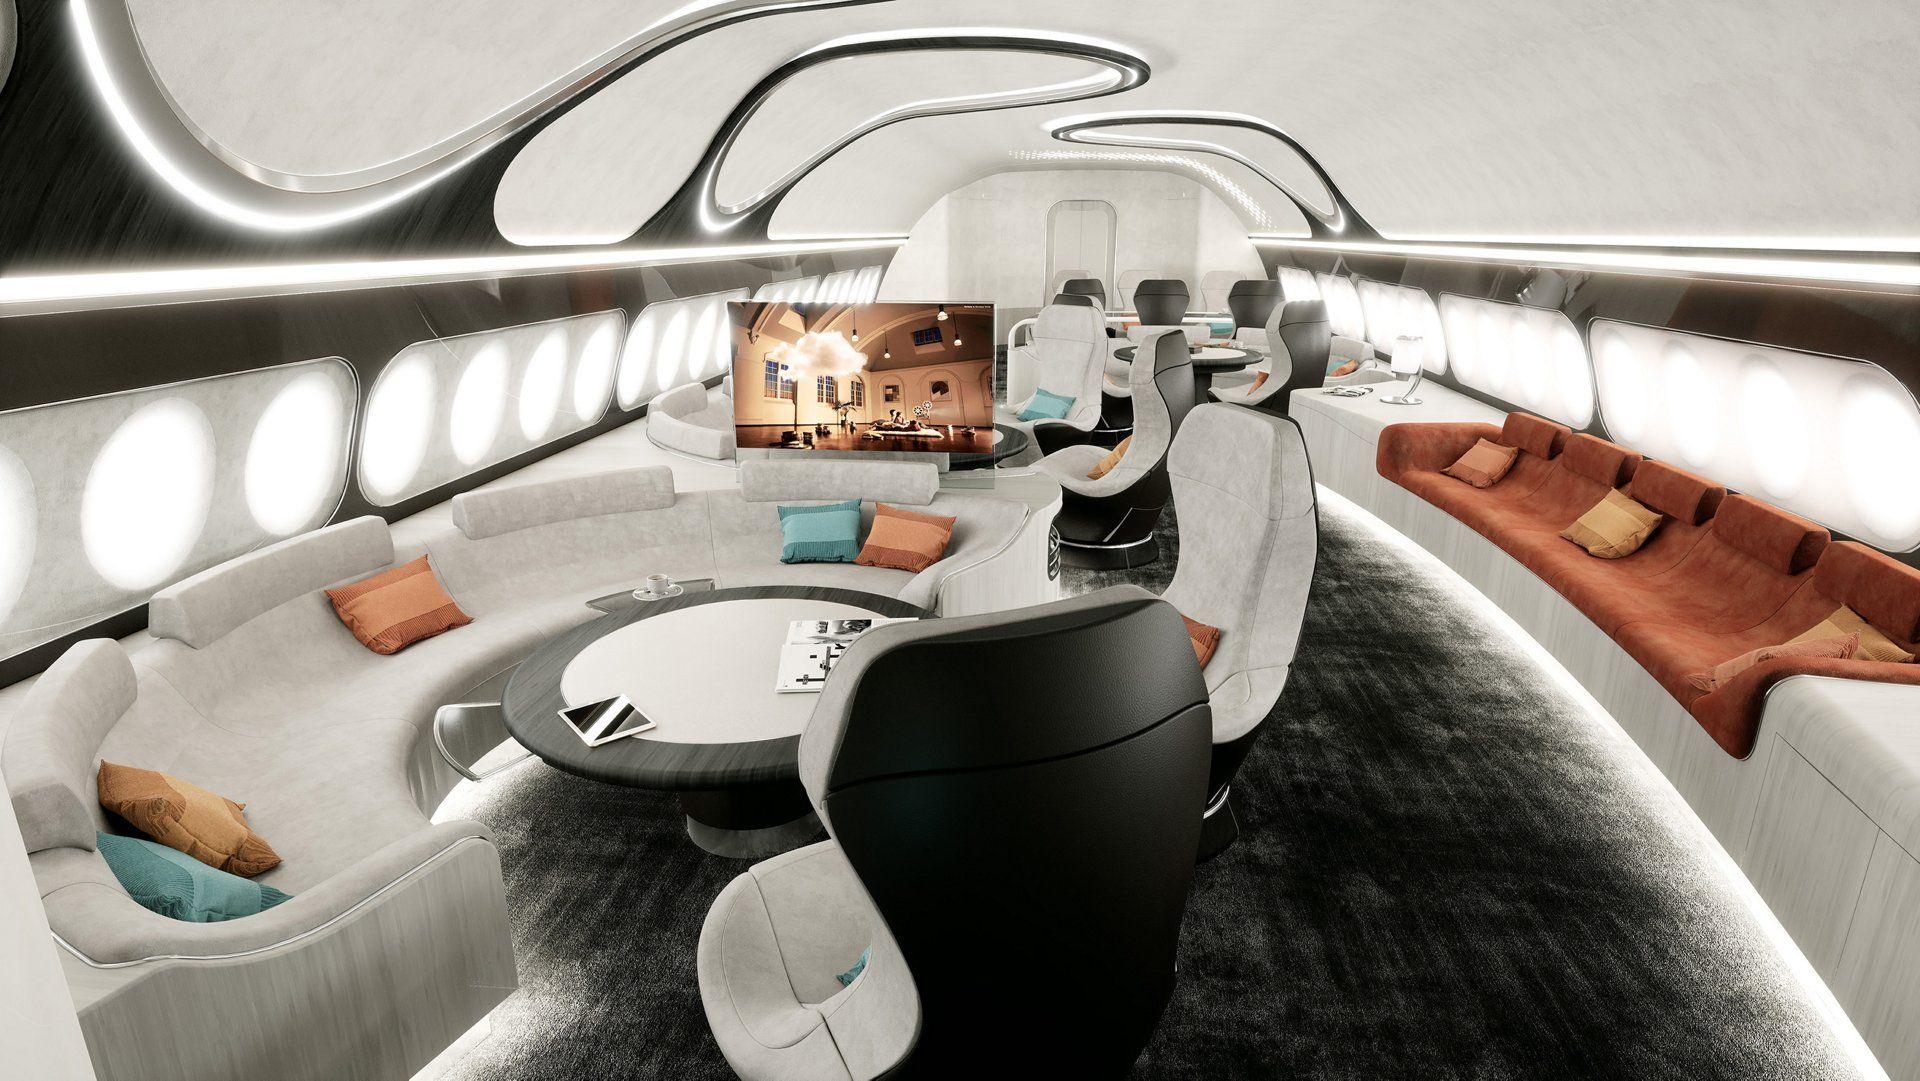 Бизнес авиация класса люкс